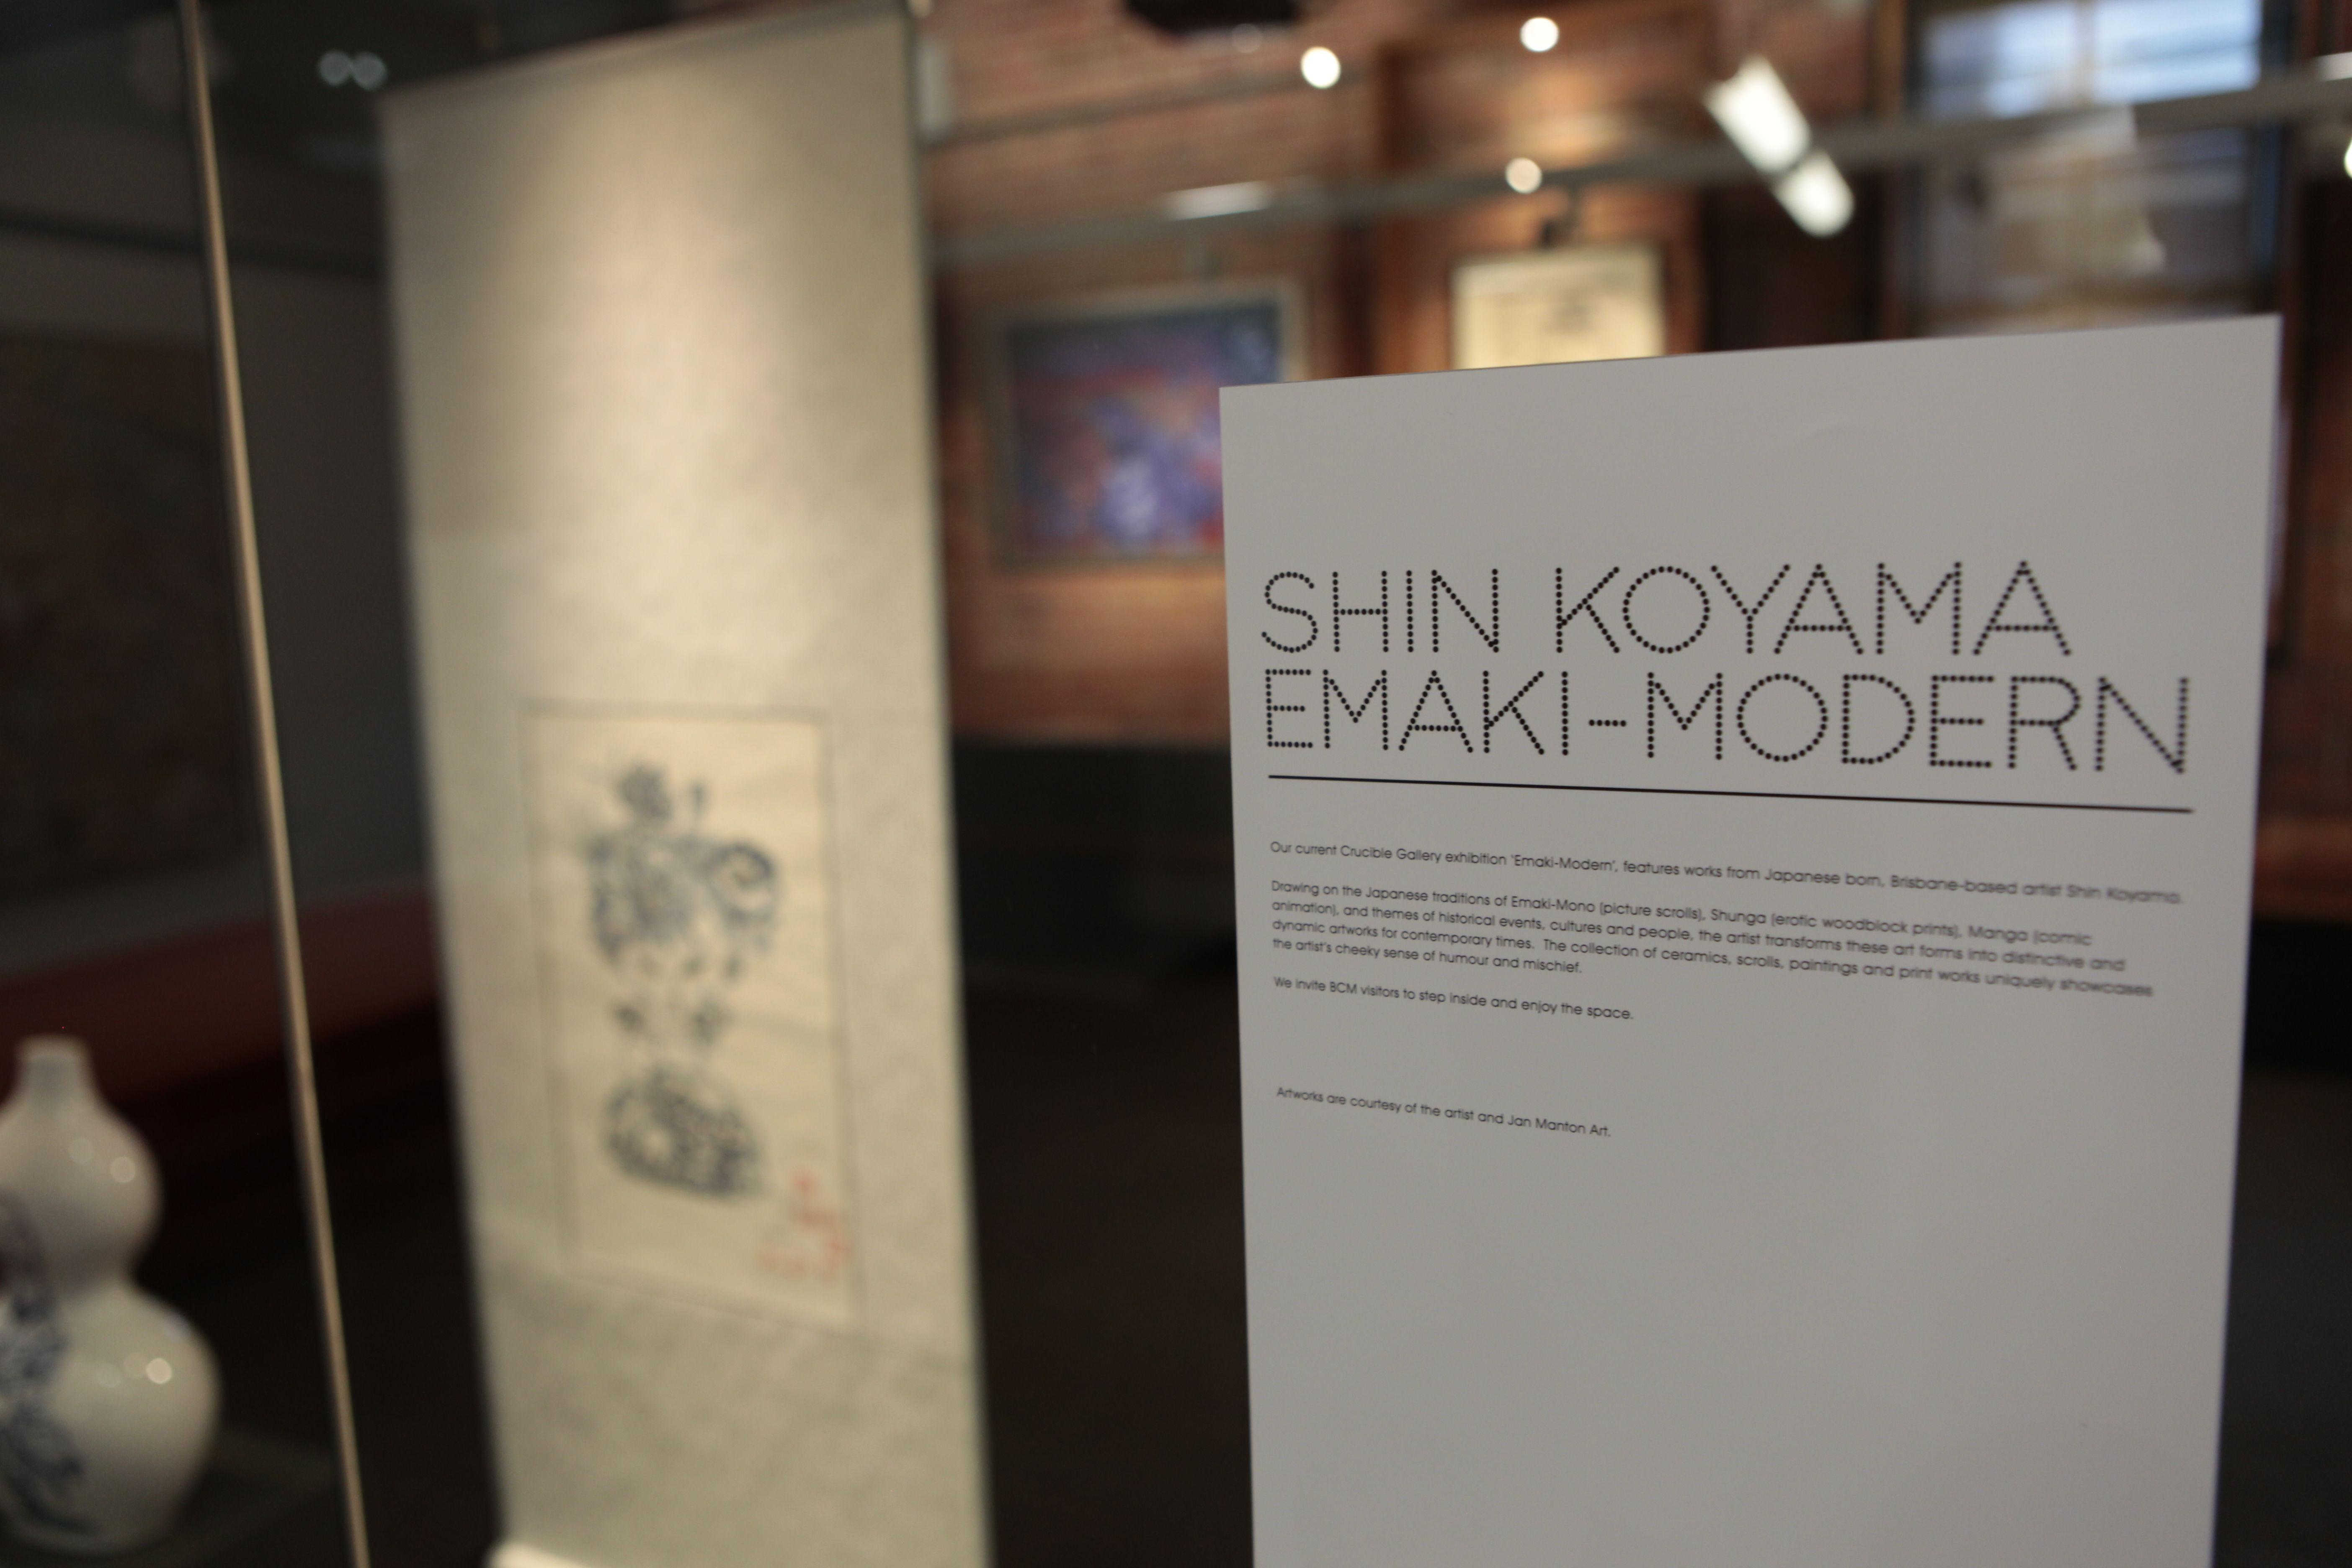 Opening night, Emaki Modern exhibition by Shin Koyama